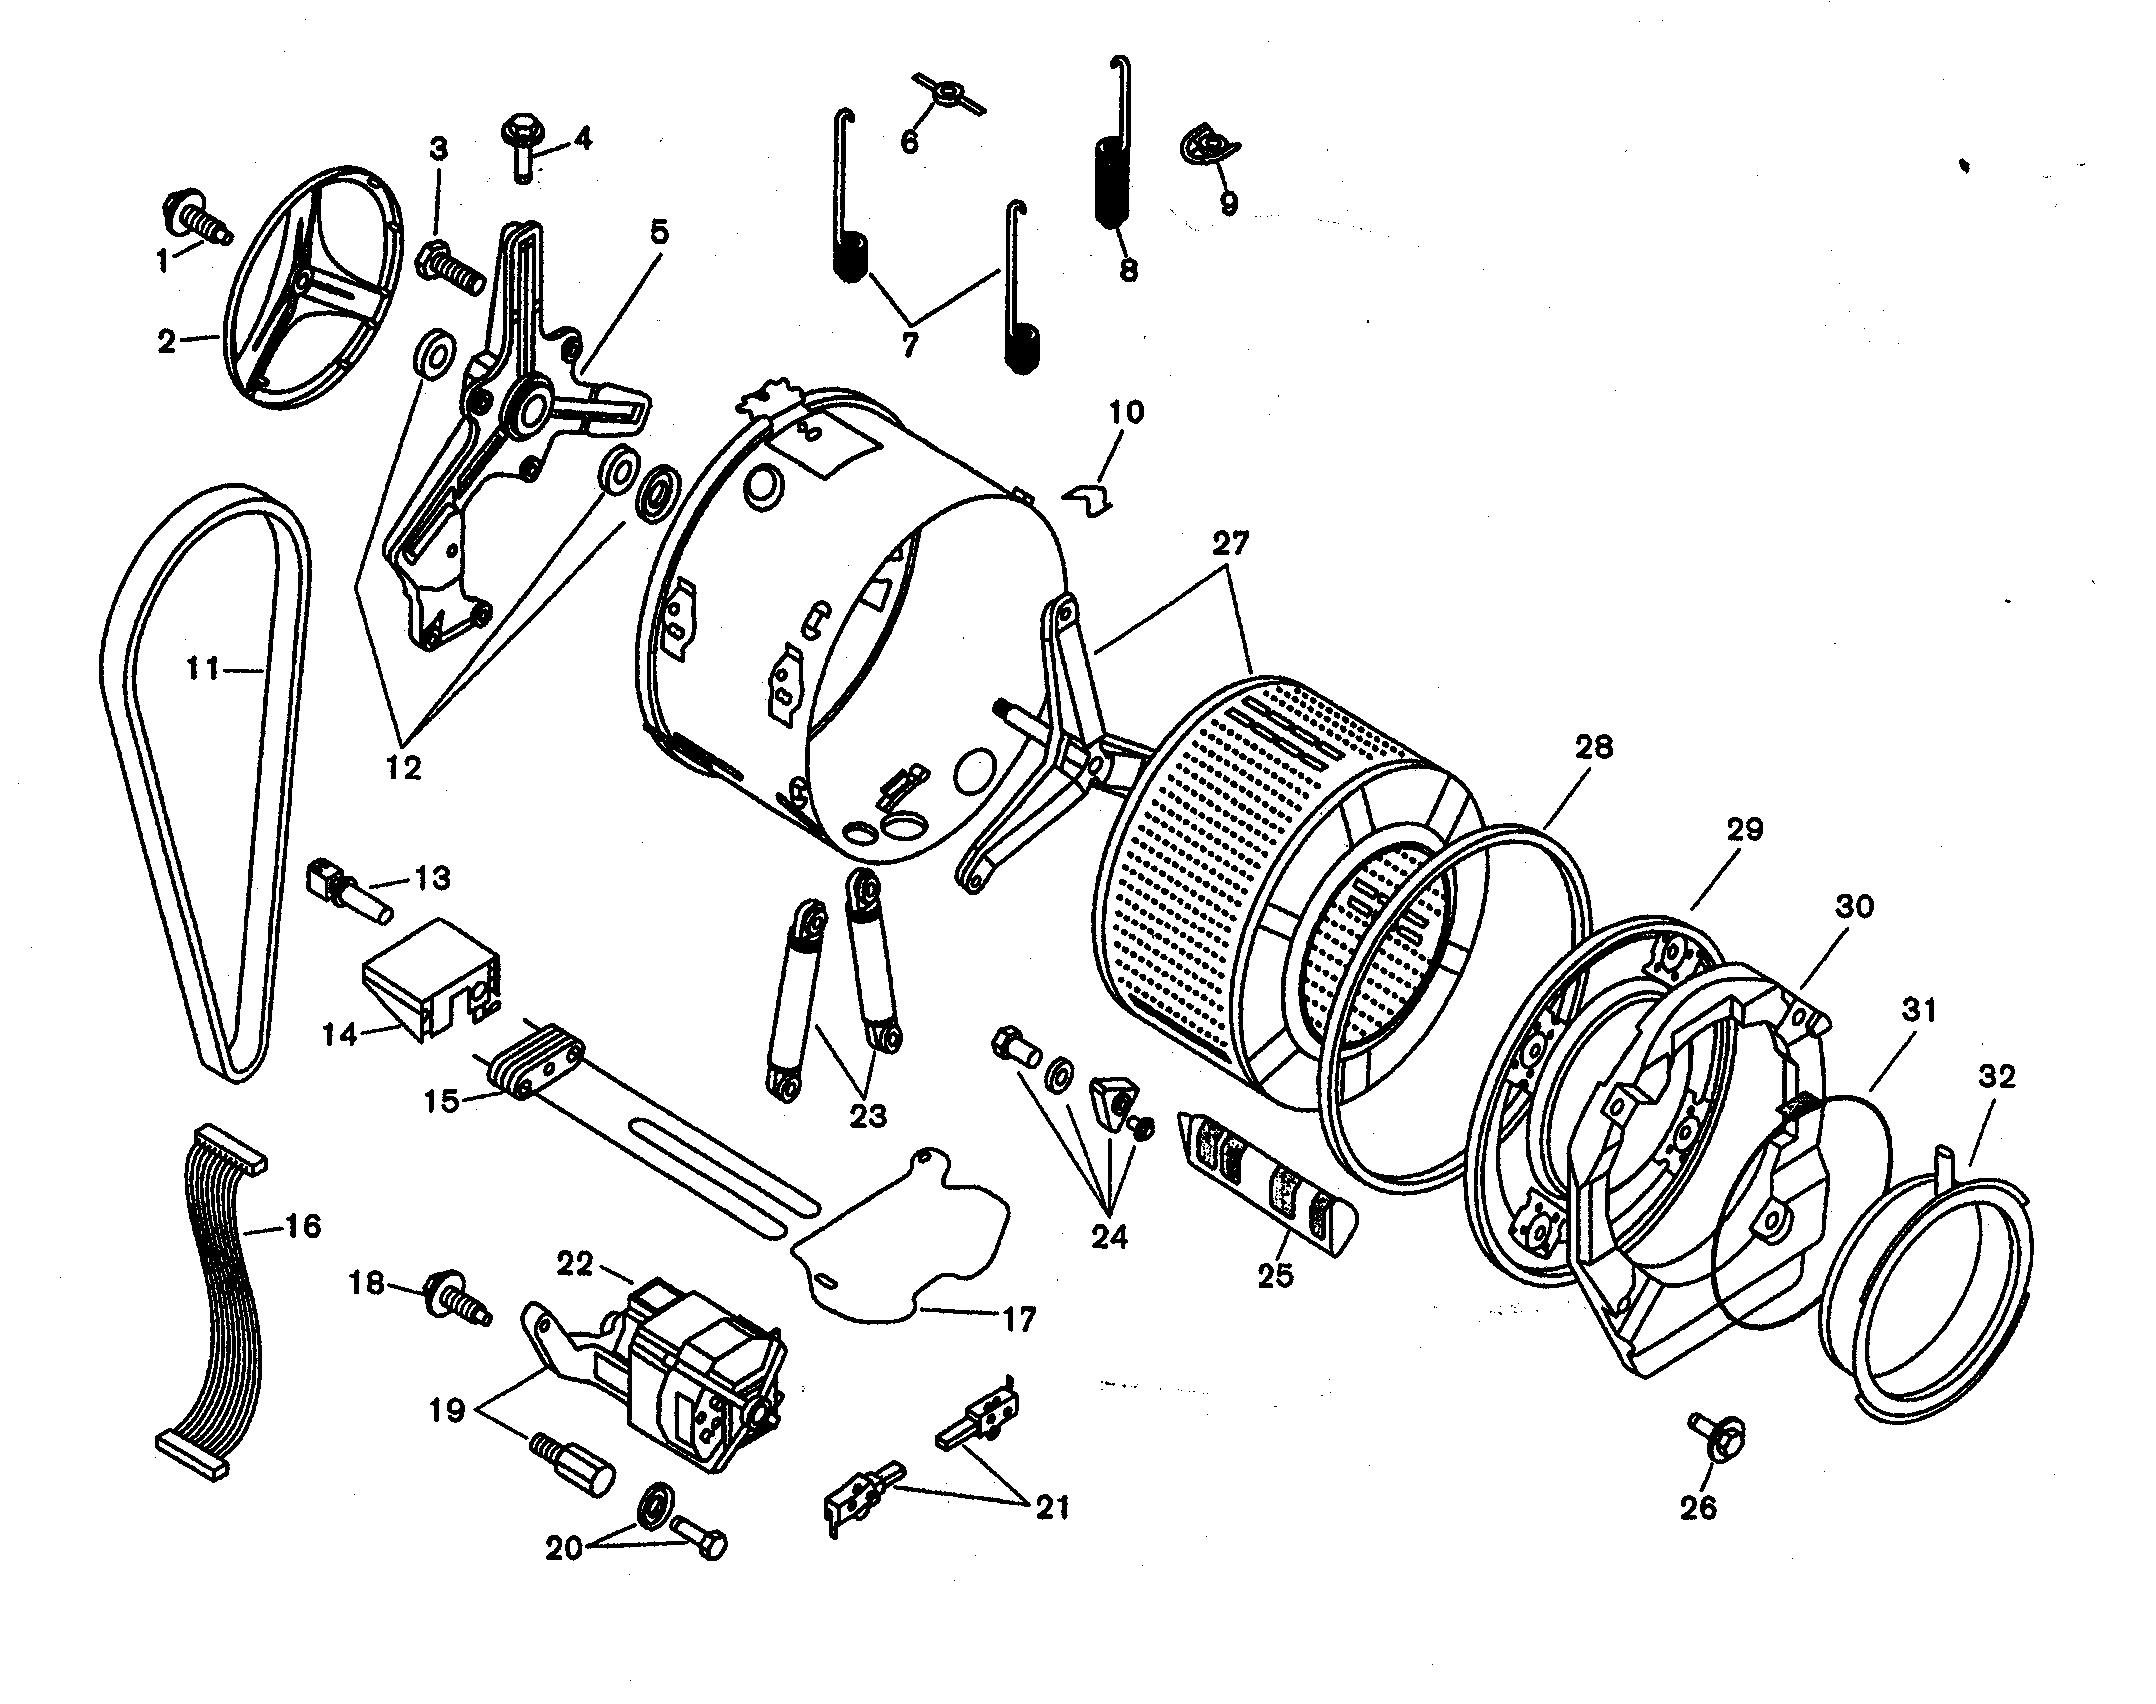 Rk 5268 Dryer Parts Diagram On Bosch Washing Machine Motor Wiring Diagram Free Diagram